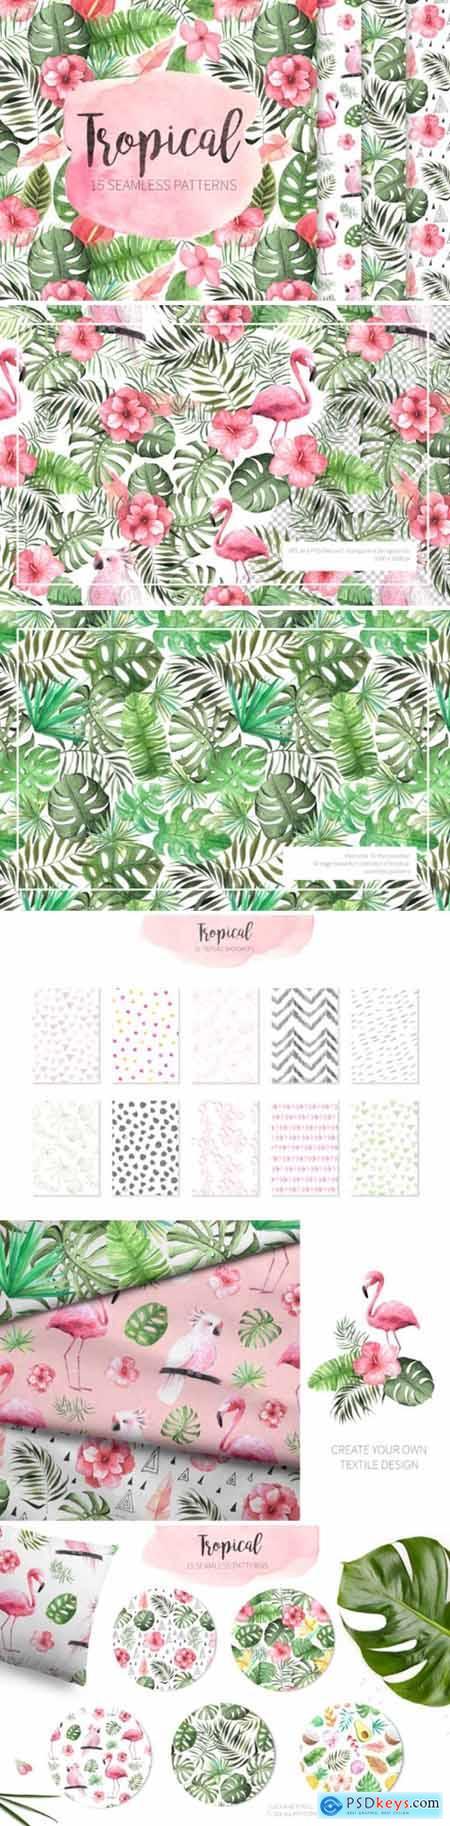 15 Watercolor Tropical Patterns Set 3527787